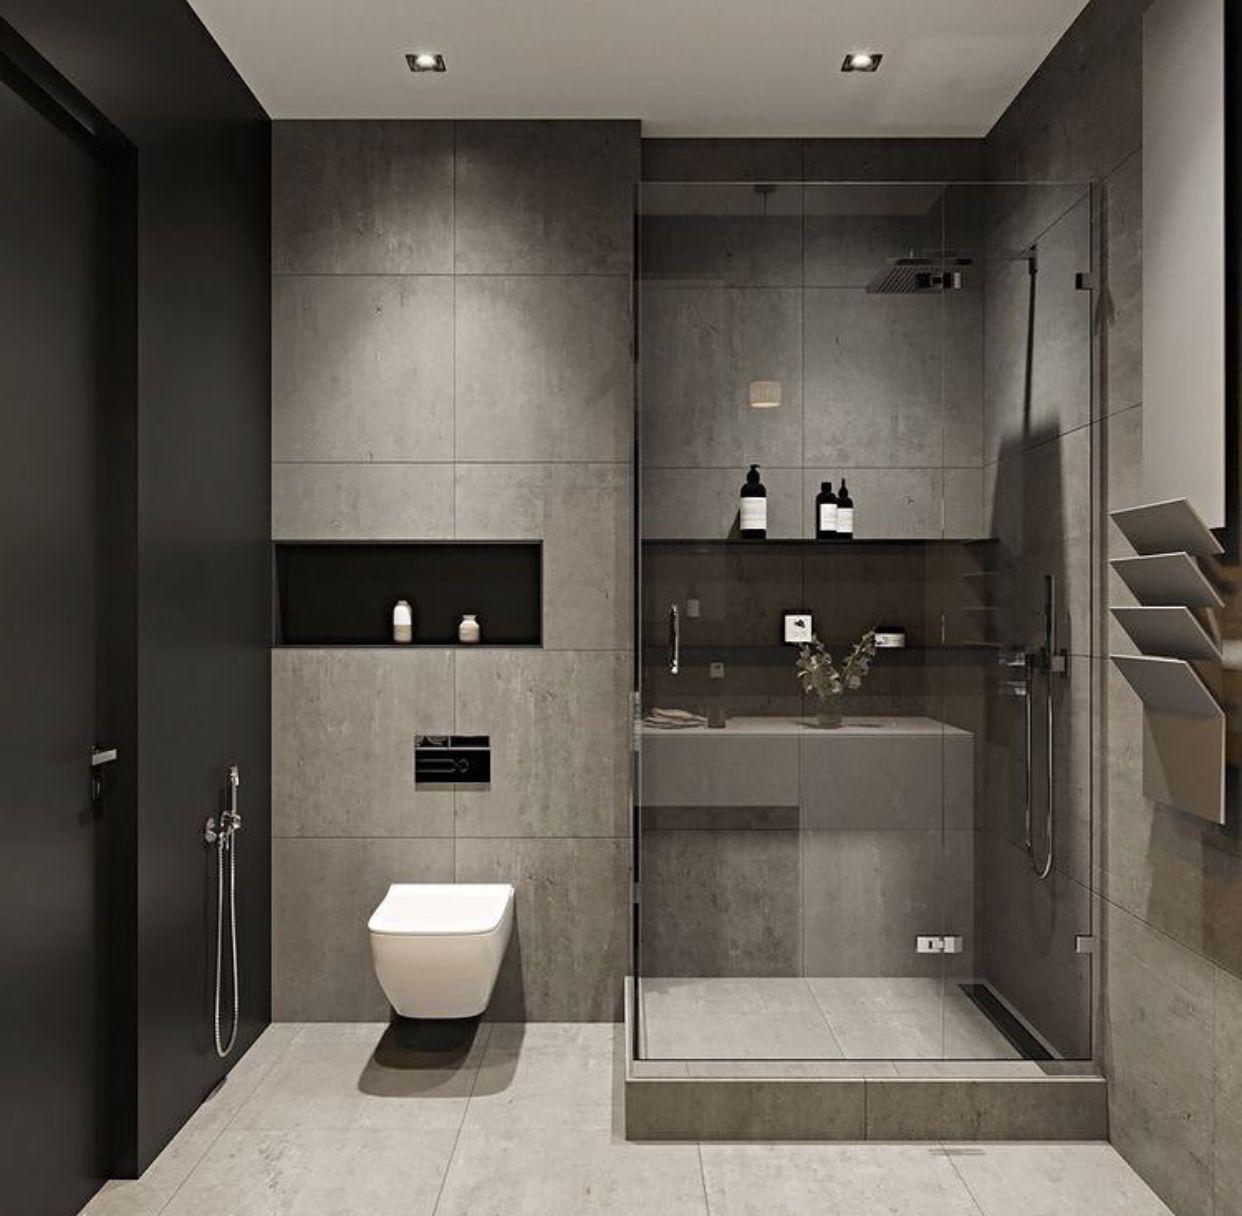 Modern Bathrooms Setting Ideas: Pin Uživatele Maha Ebrahim Na Nástěnce حمامات مودرن